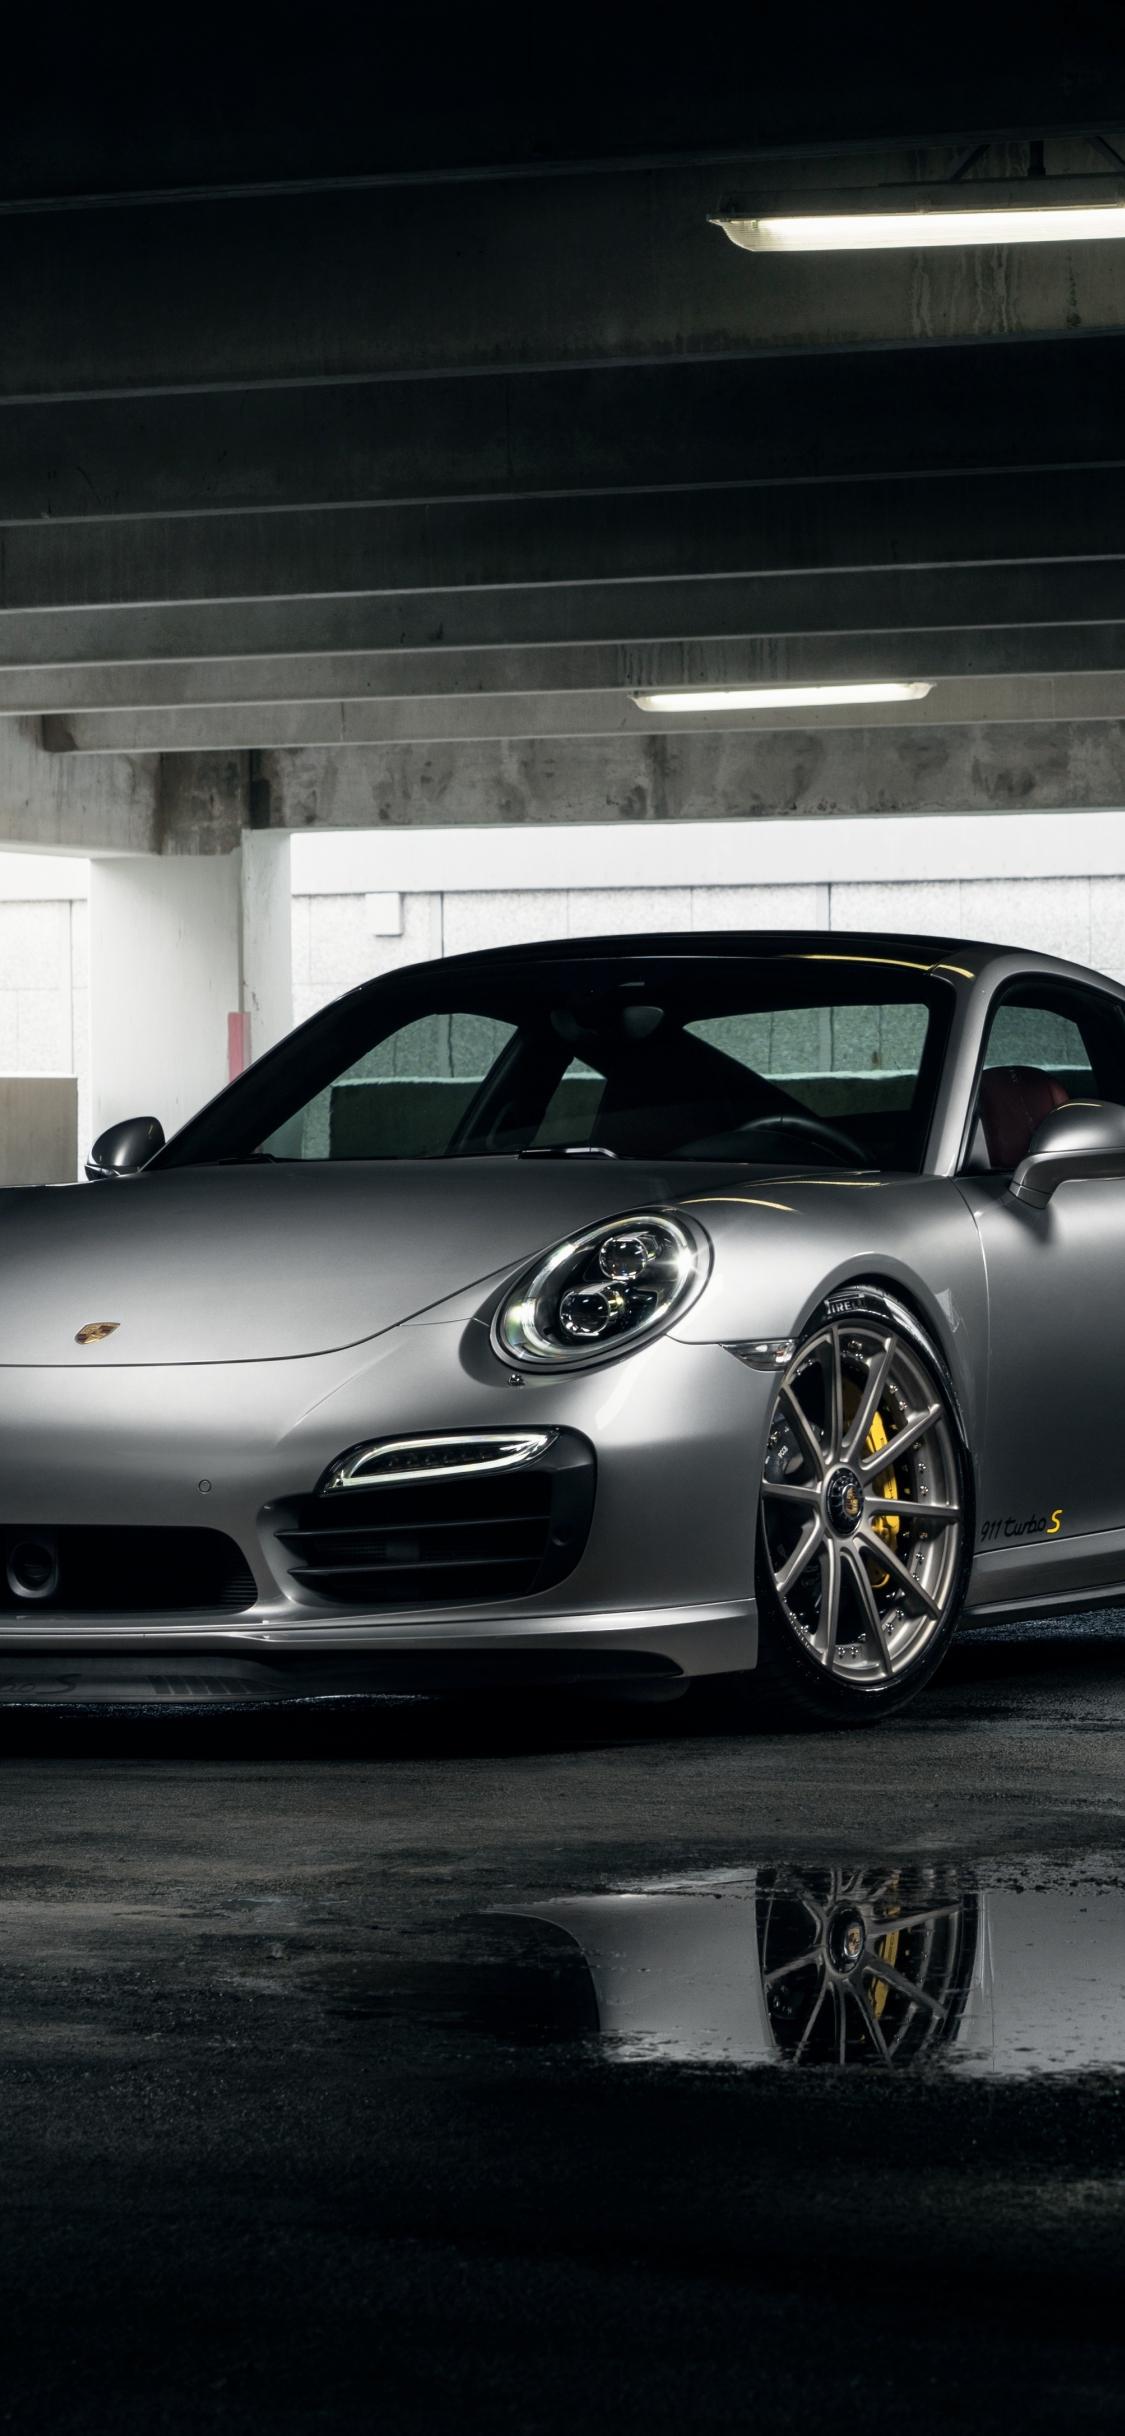 Download 1125x2436 Wallpaper Porsche 911 Turbo Gray Sports Car